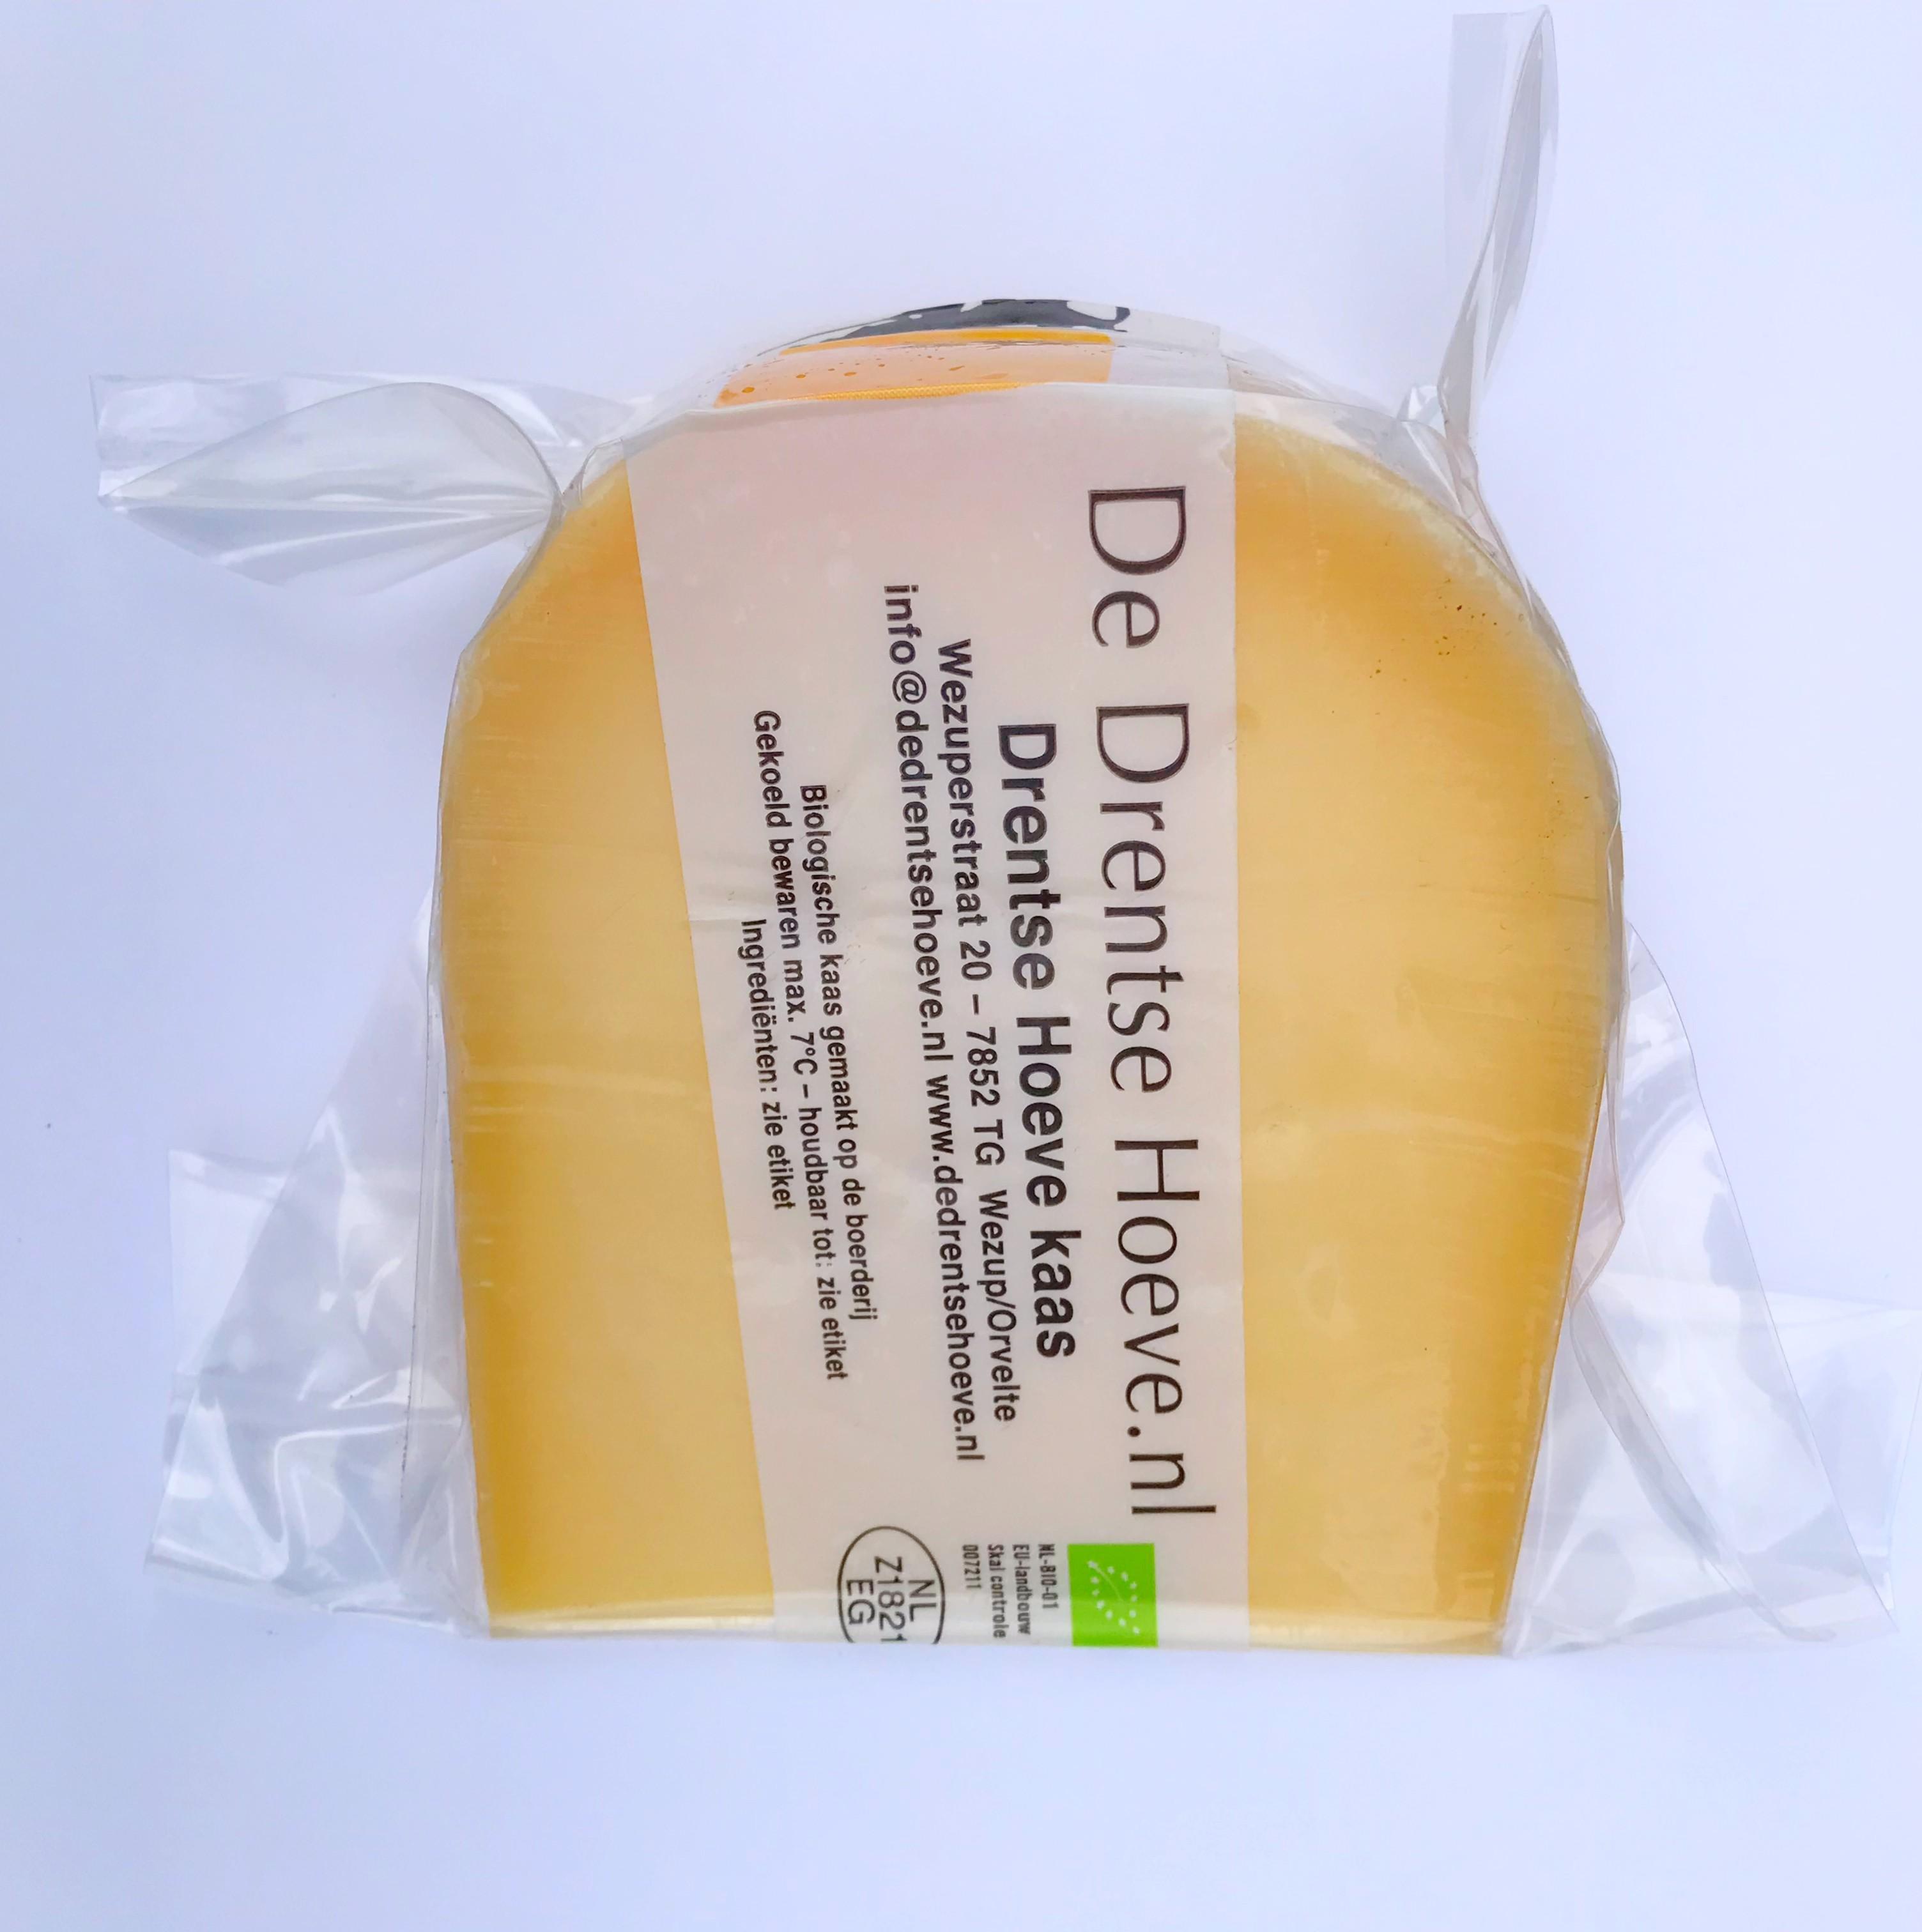 Belegen kaas De Drentse Hoeve